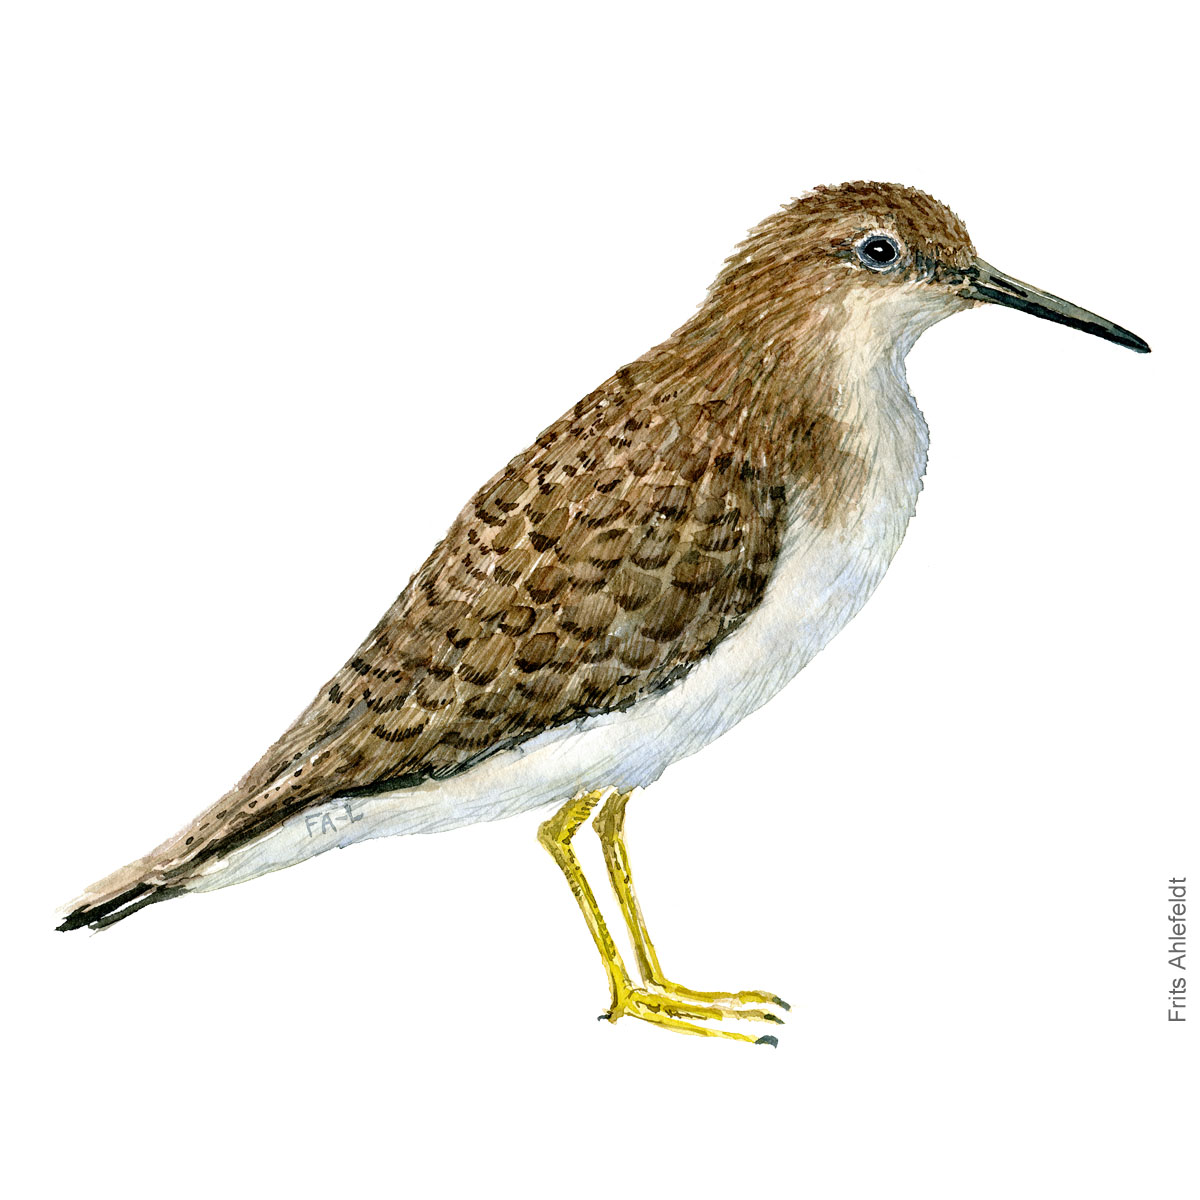 Mudderklire - Common sandpiper Bird watercolor. Fugle akvarel af Frits Ahlefeldt